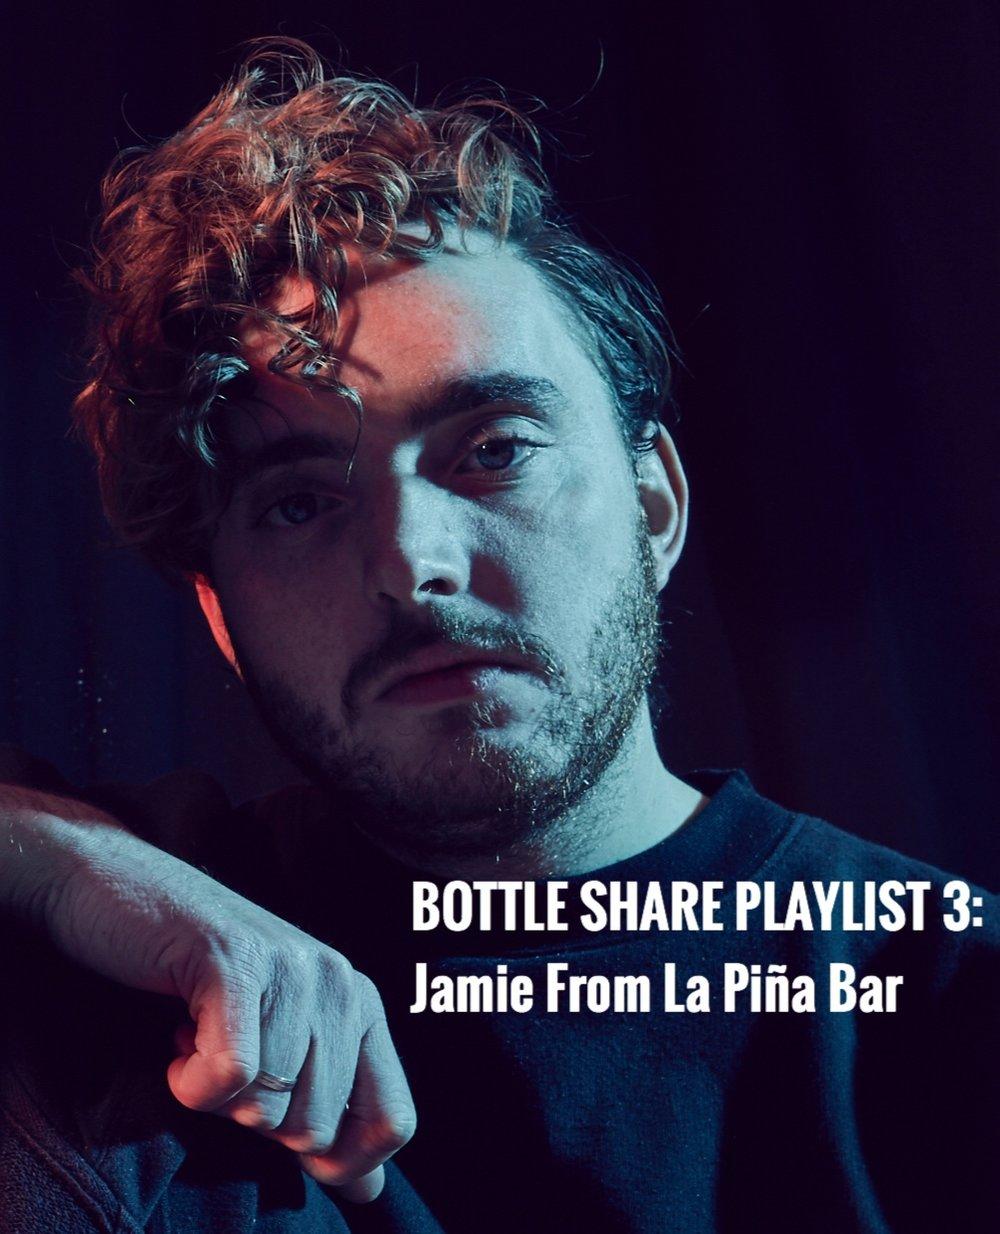 La-Piña-Bar-Barcelona-Jamie.jpg